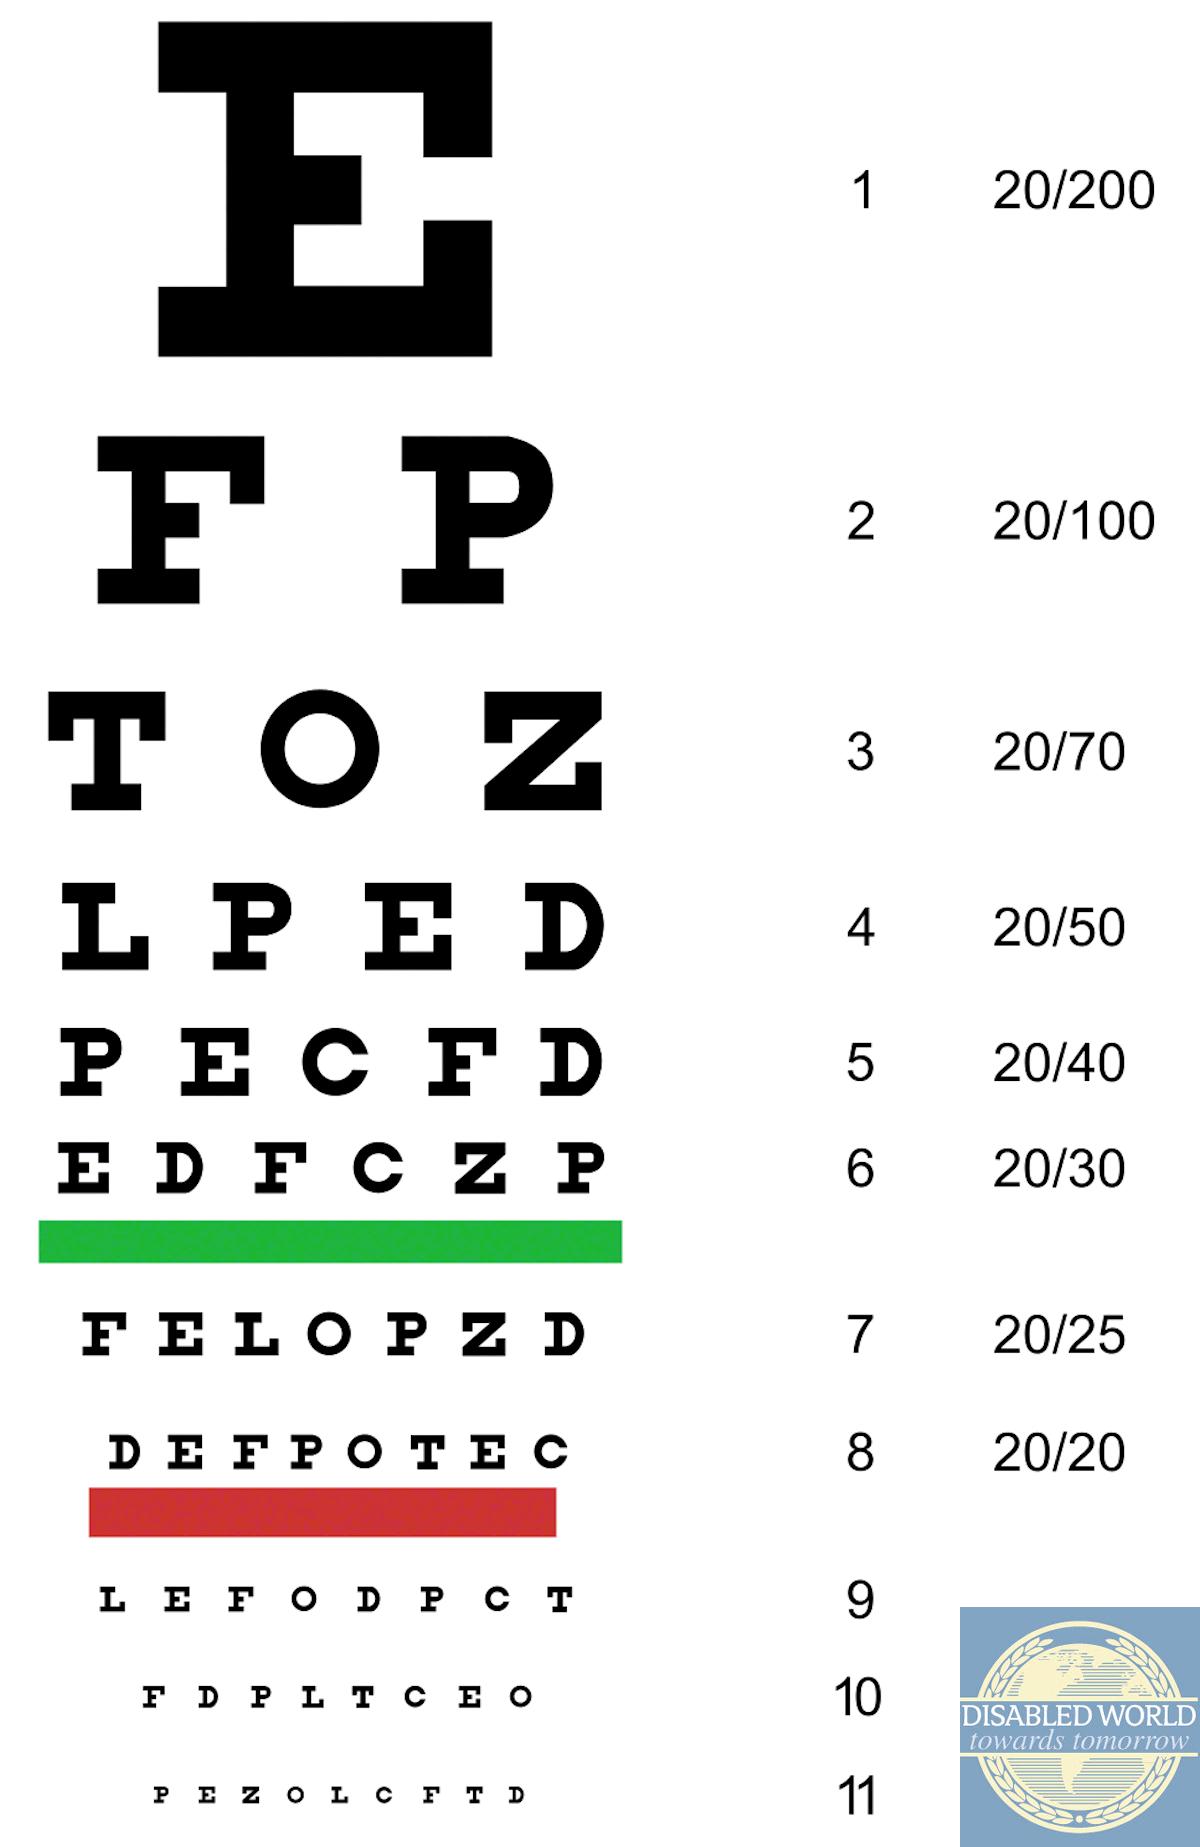 Printable Snellen Eye Charts Disabled World